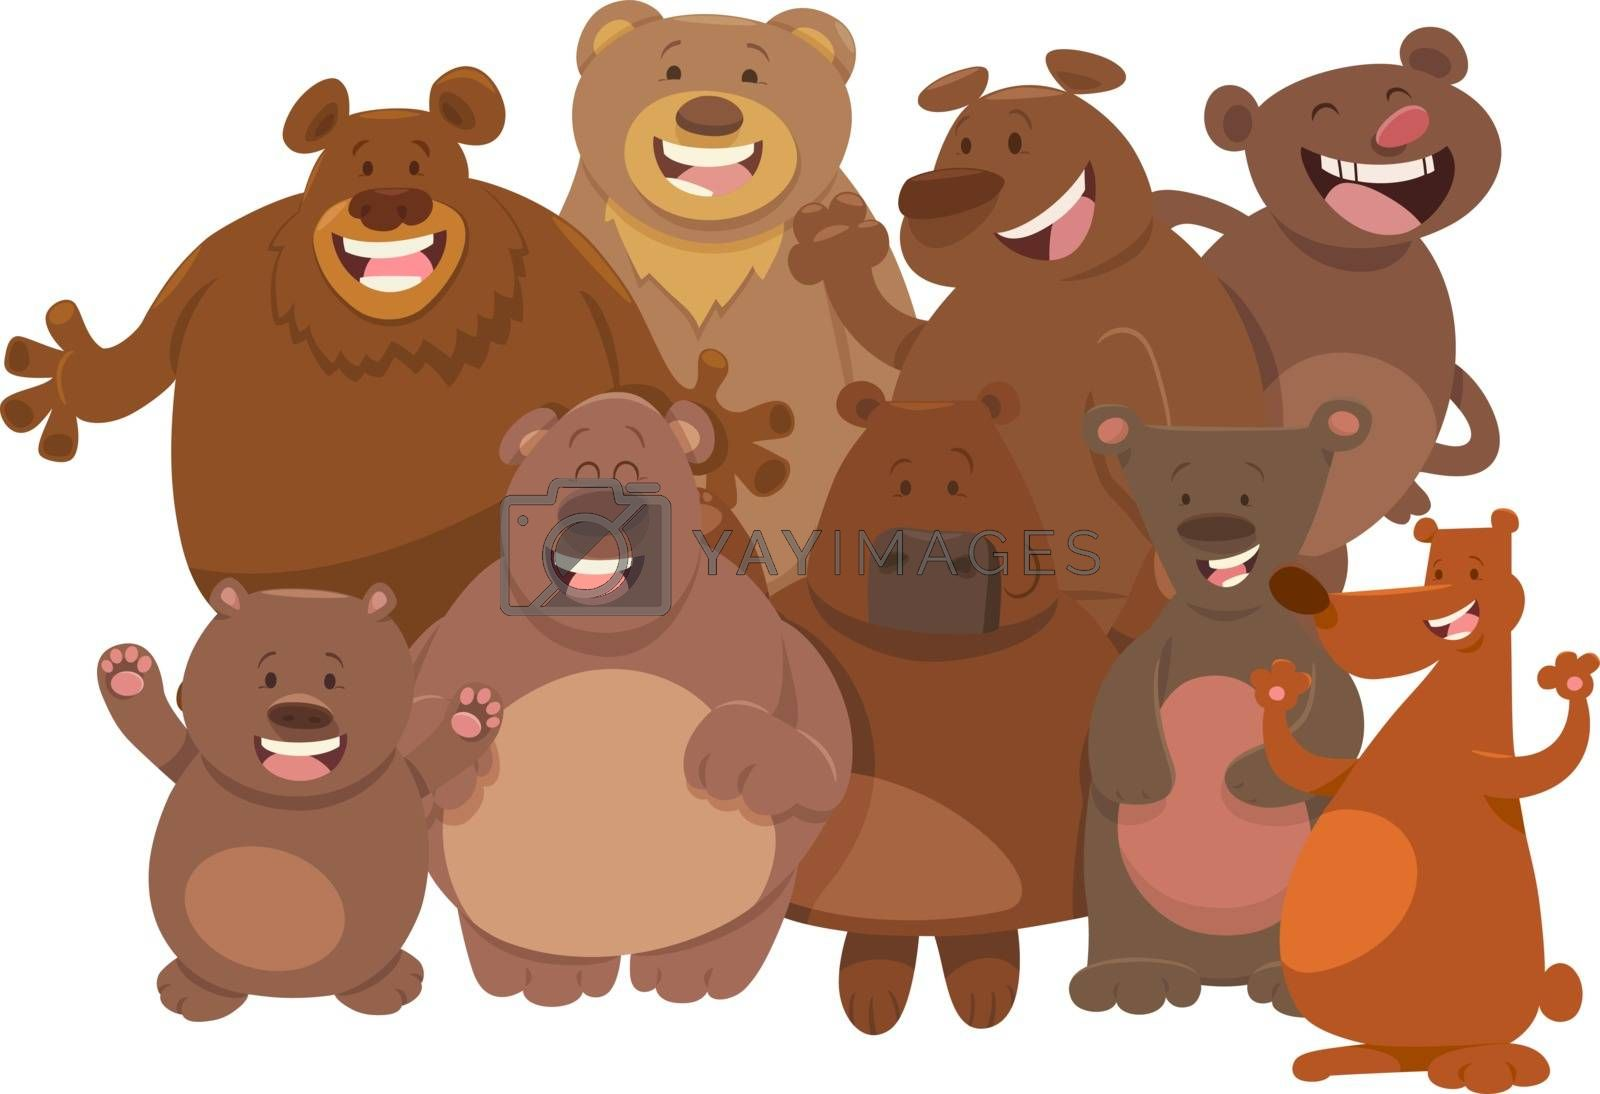 cartoon wild bears animal characters group by izakowski